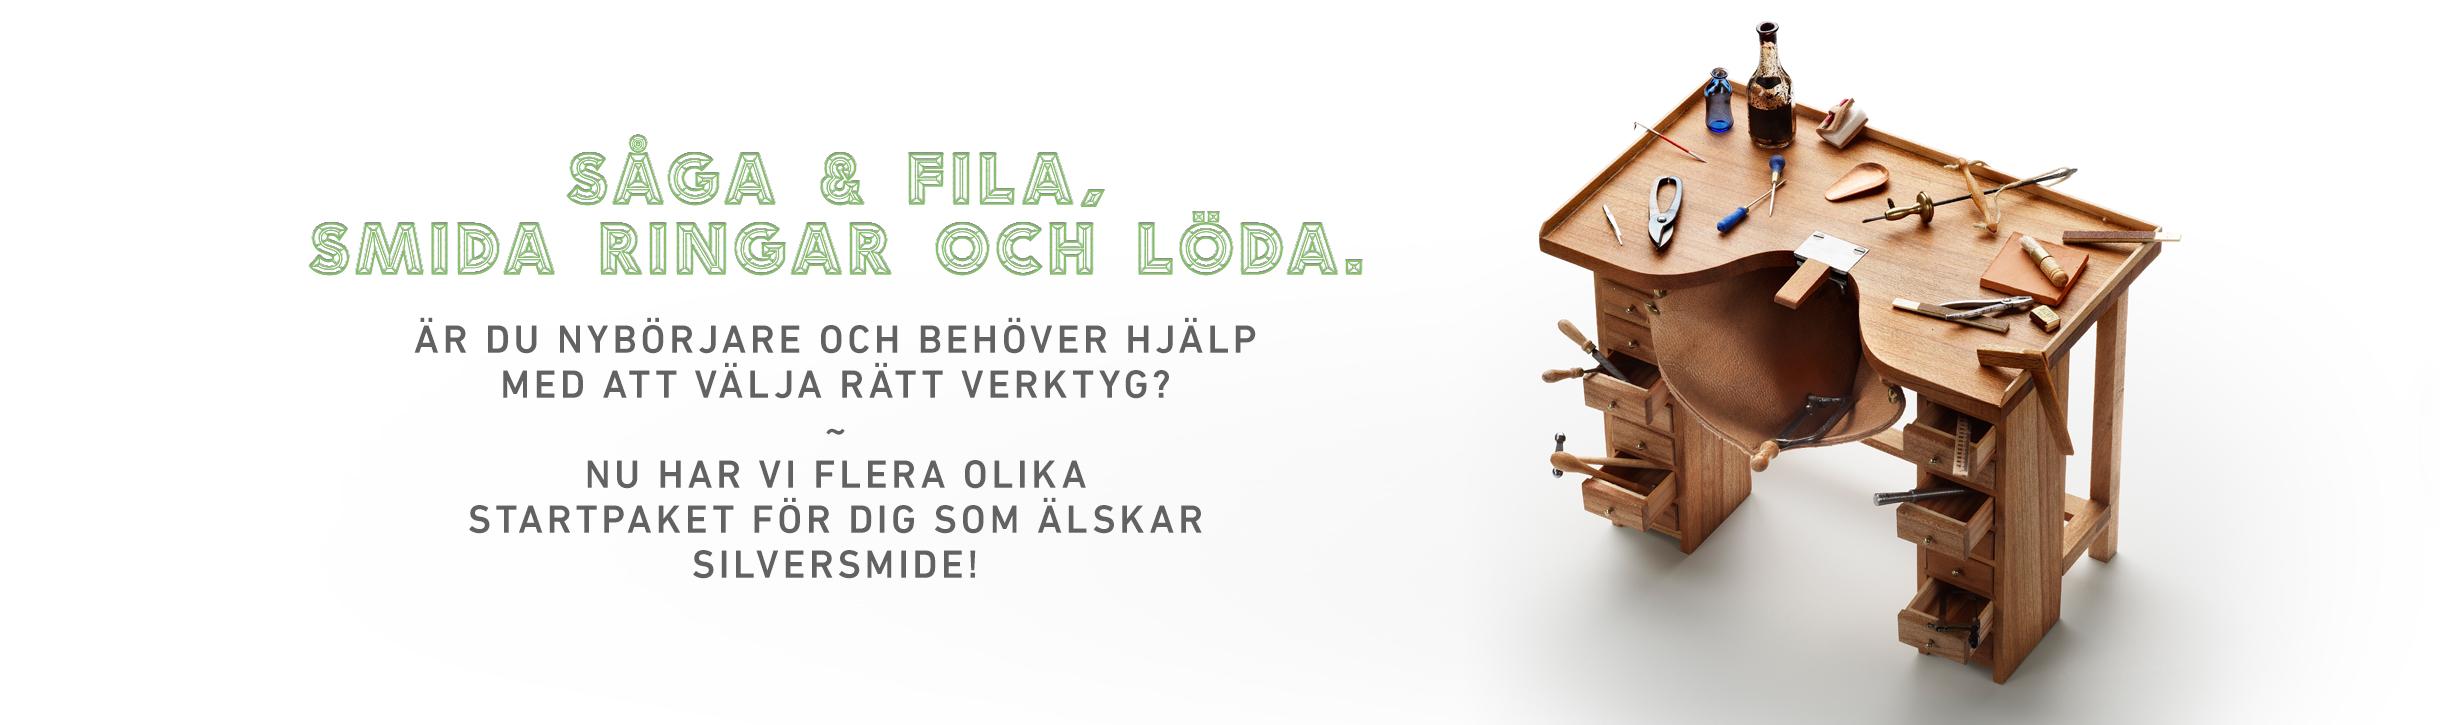 silversmide verktyg stockholm